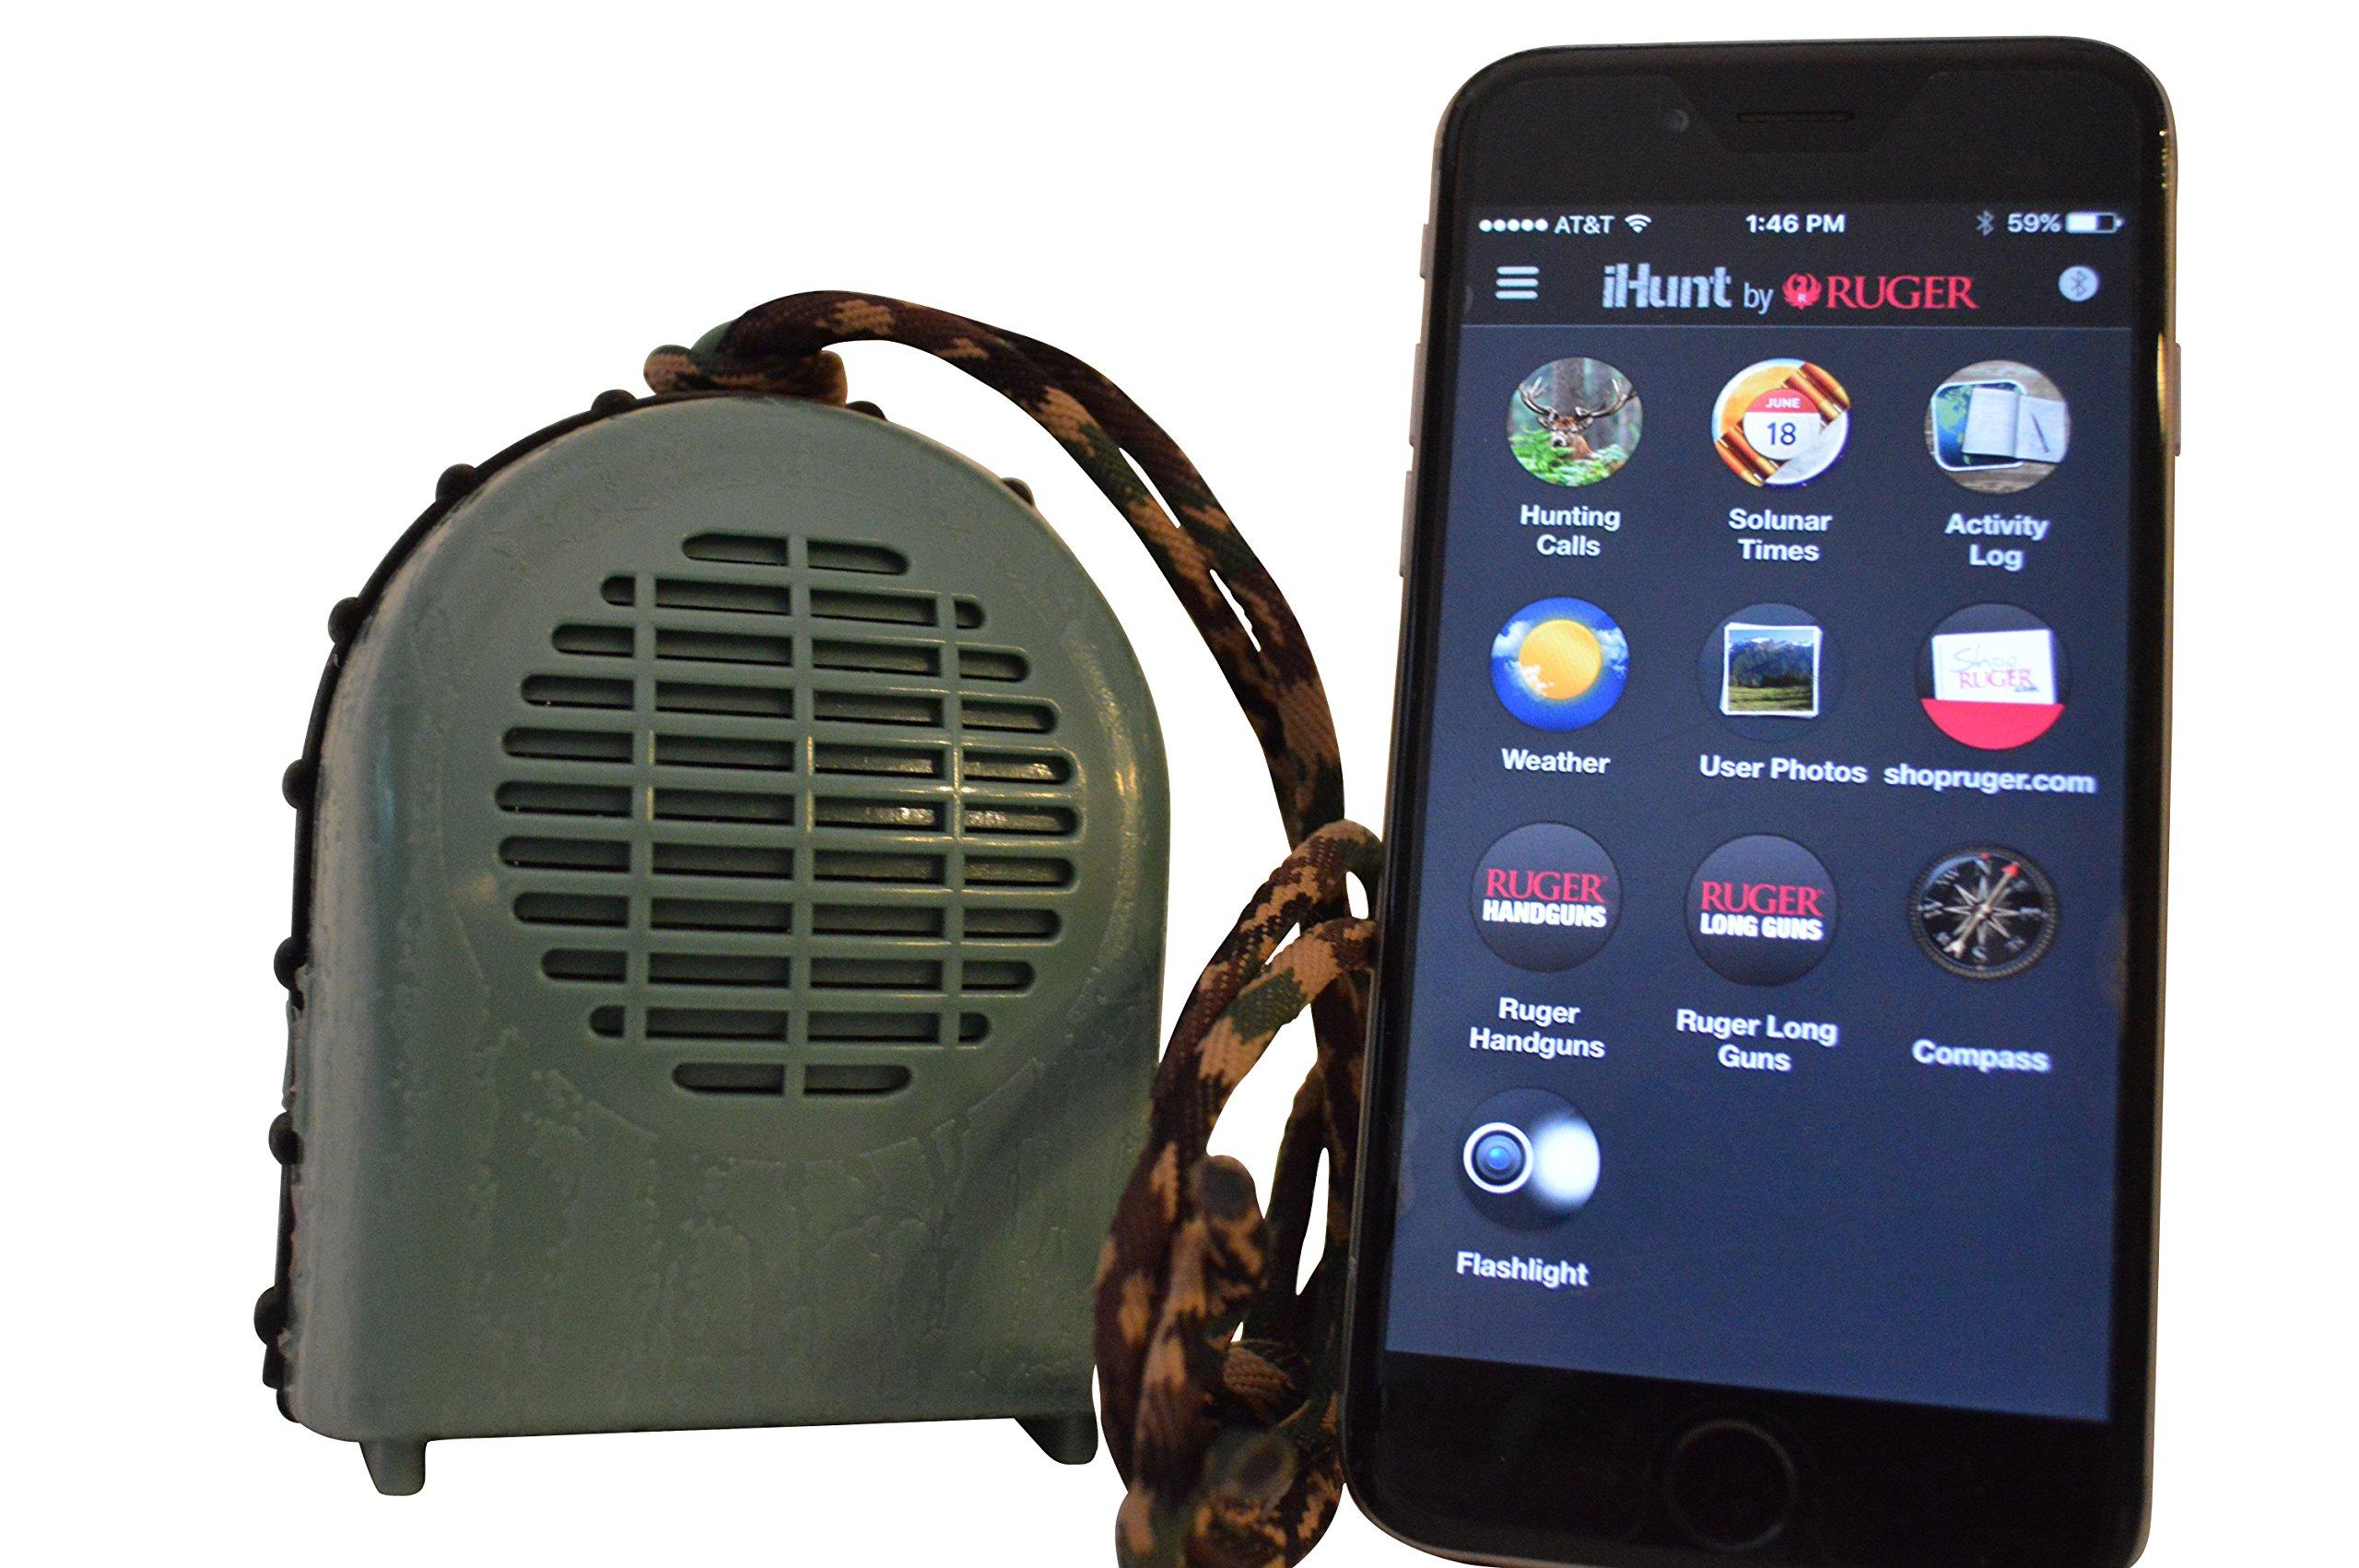 Extreme Dimension Wildlife Calls - iHunt XSB Game Call - Bluetooth App & Speaker - 700 calls - Electronic Game Calls - Hunting Calls - iHunt